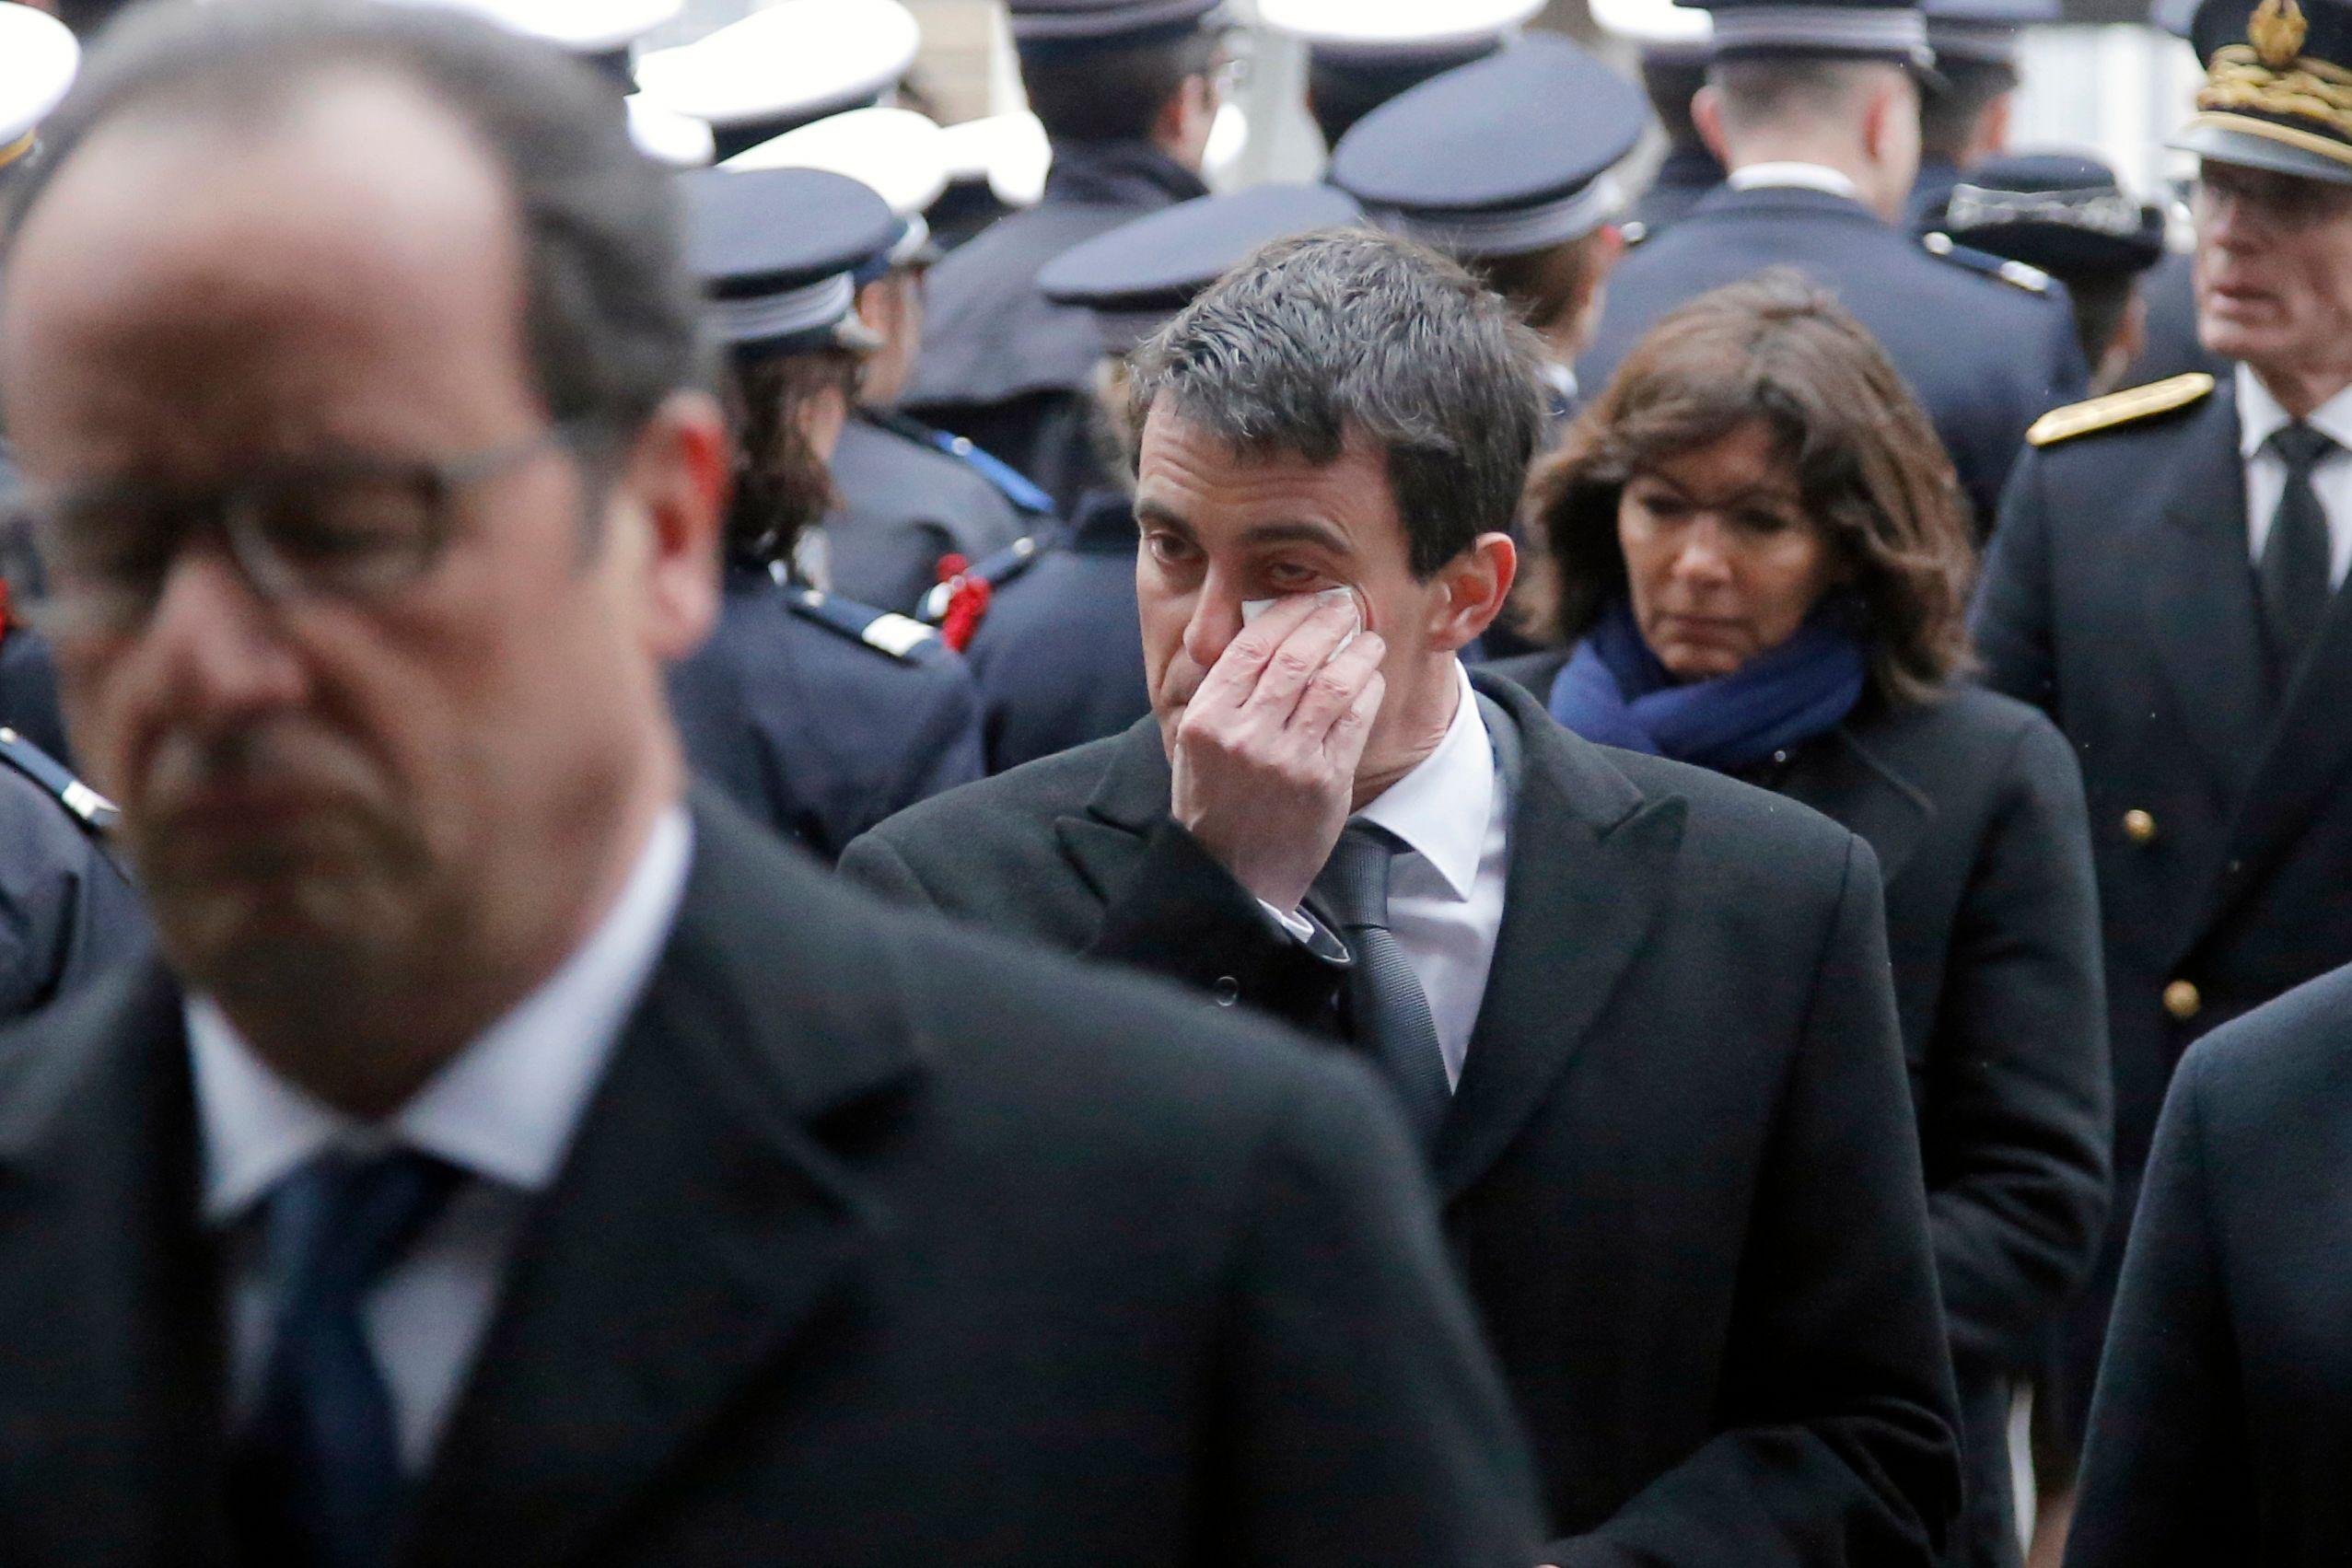 François Hollande et Manuel Valls en opposition sur le vote des musulmans